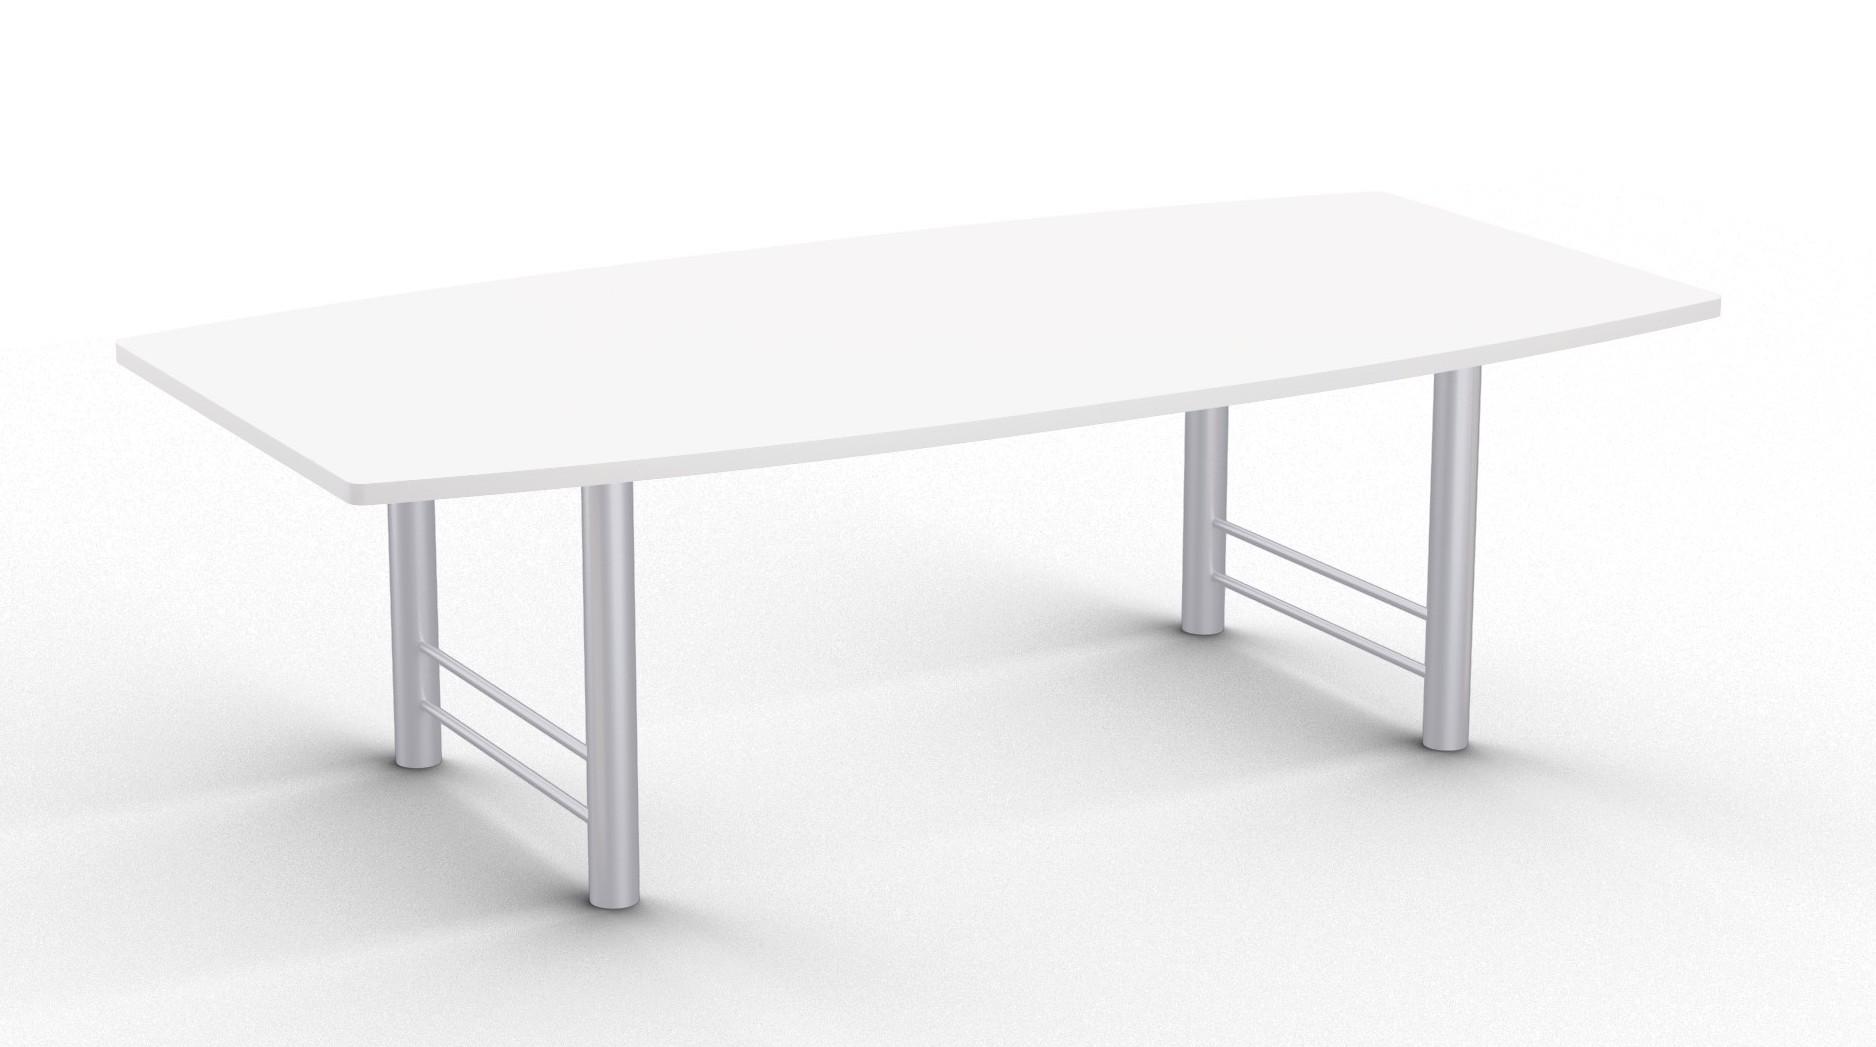 benton boat shaped table